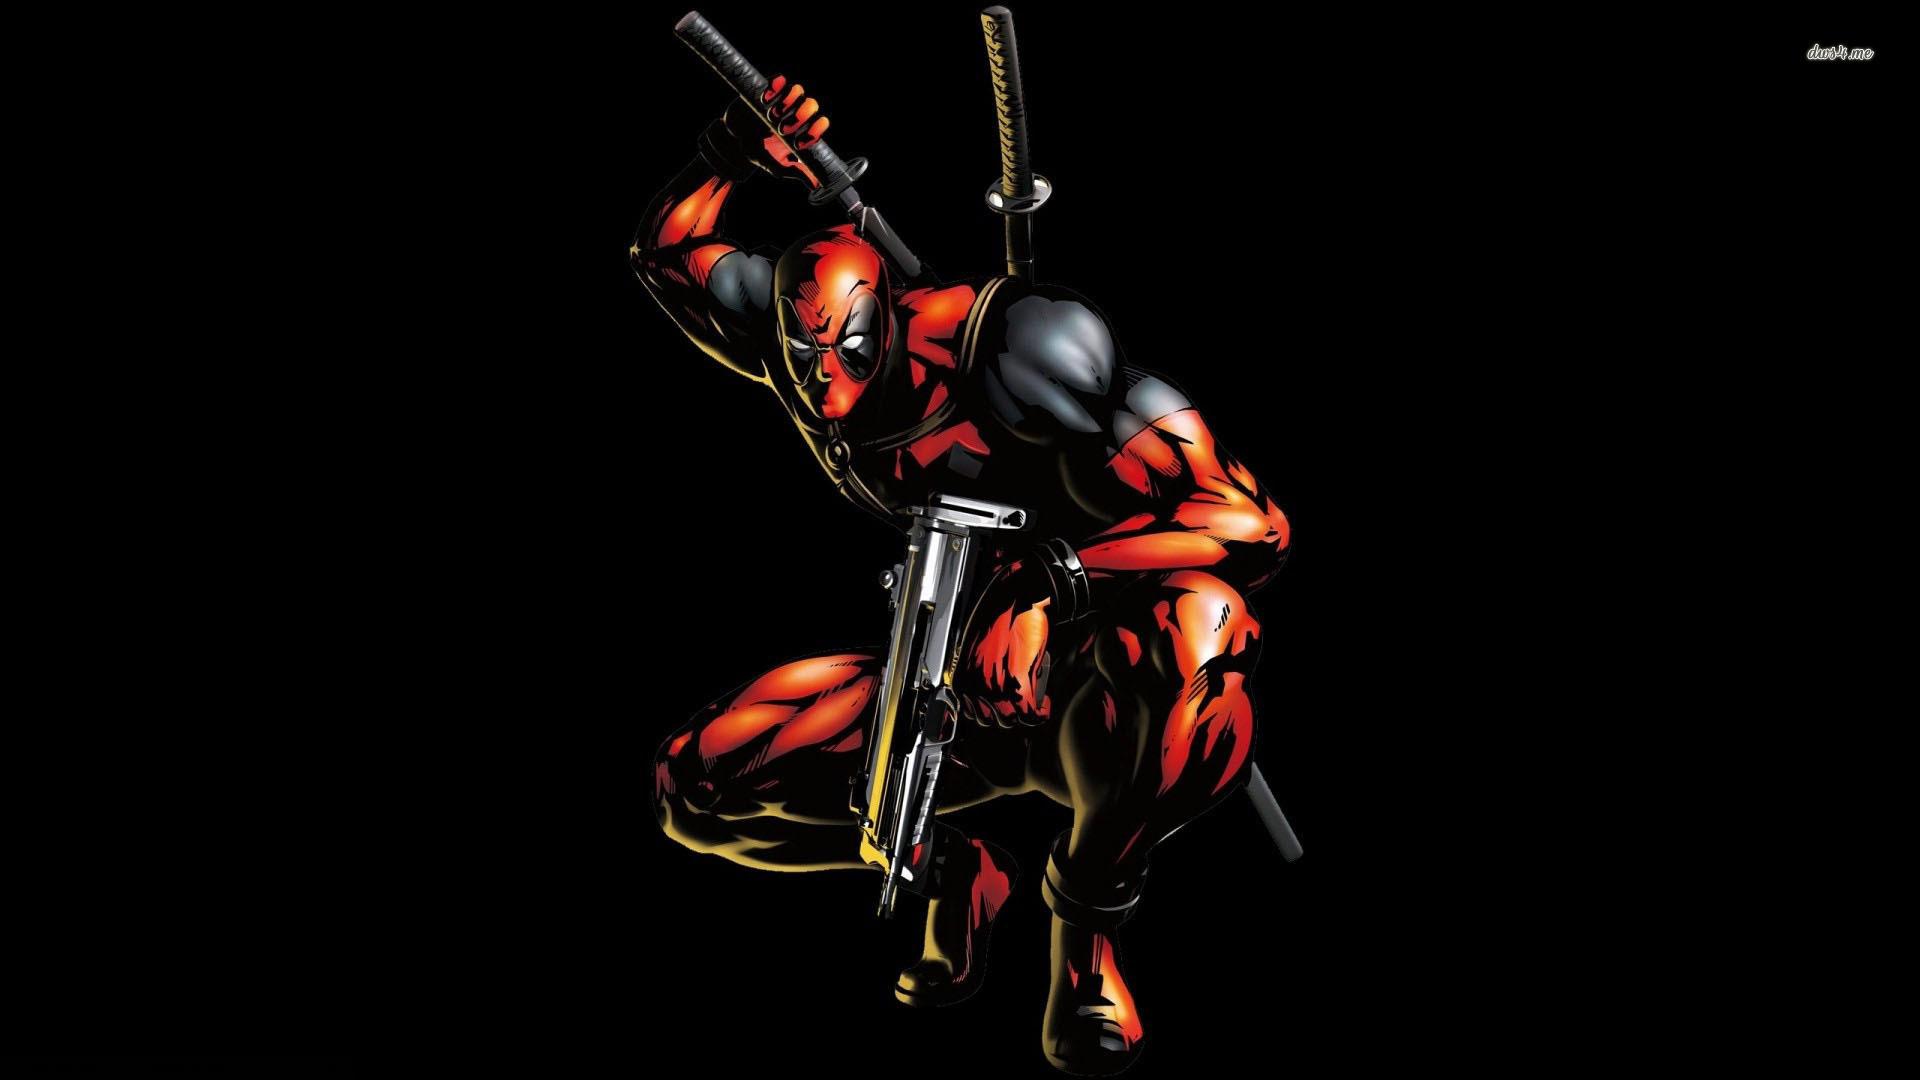 Deadpool wallpaper 1280×800 Deadpool wallpaper 1366×768 Deadpool .